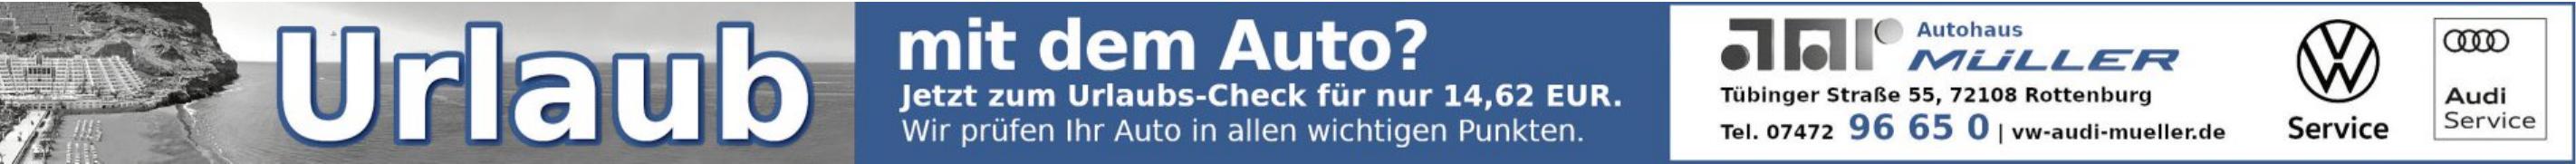 Autohaus Adolf Müller GmbH